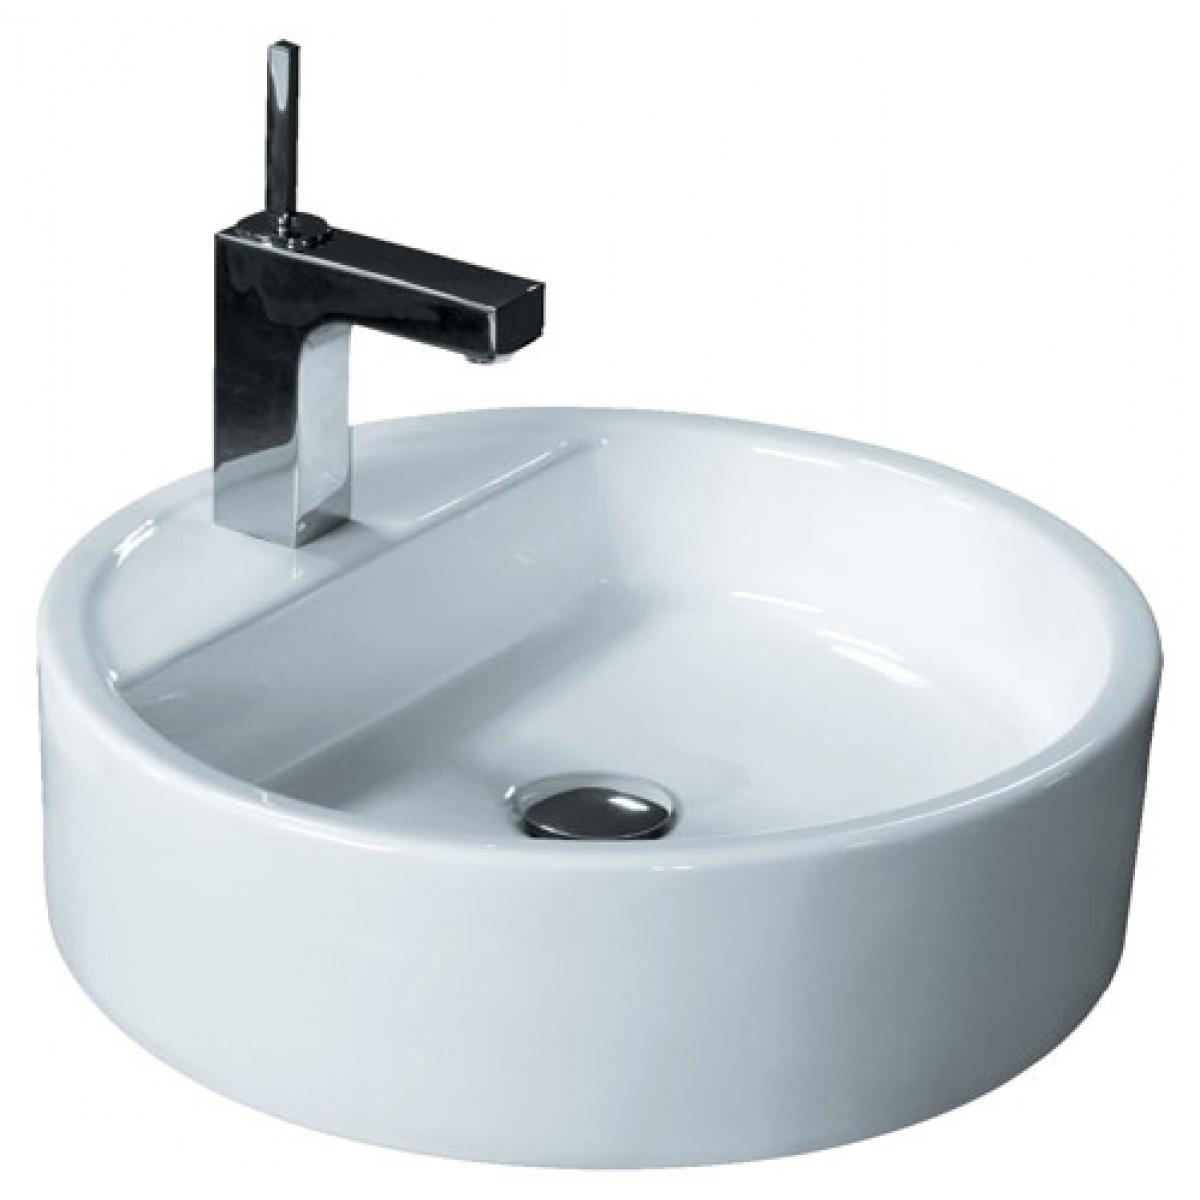 Round Porcelain Ceramic Single Hole Countertop Bathroom Vessel Sink 18 X 4 Inch